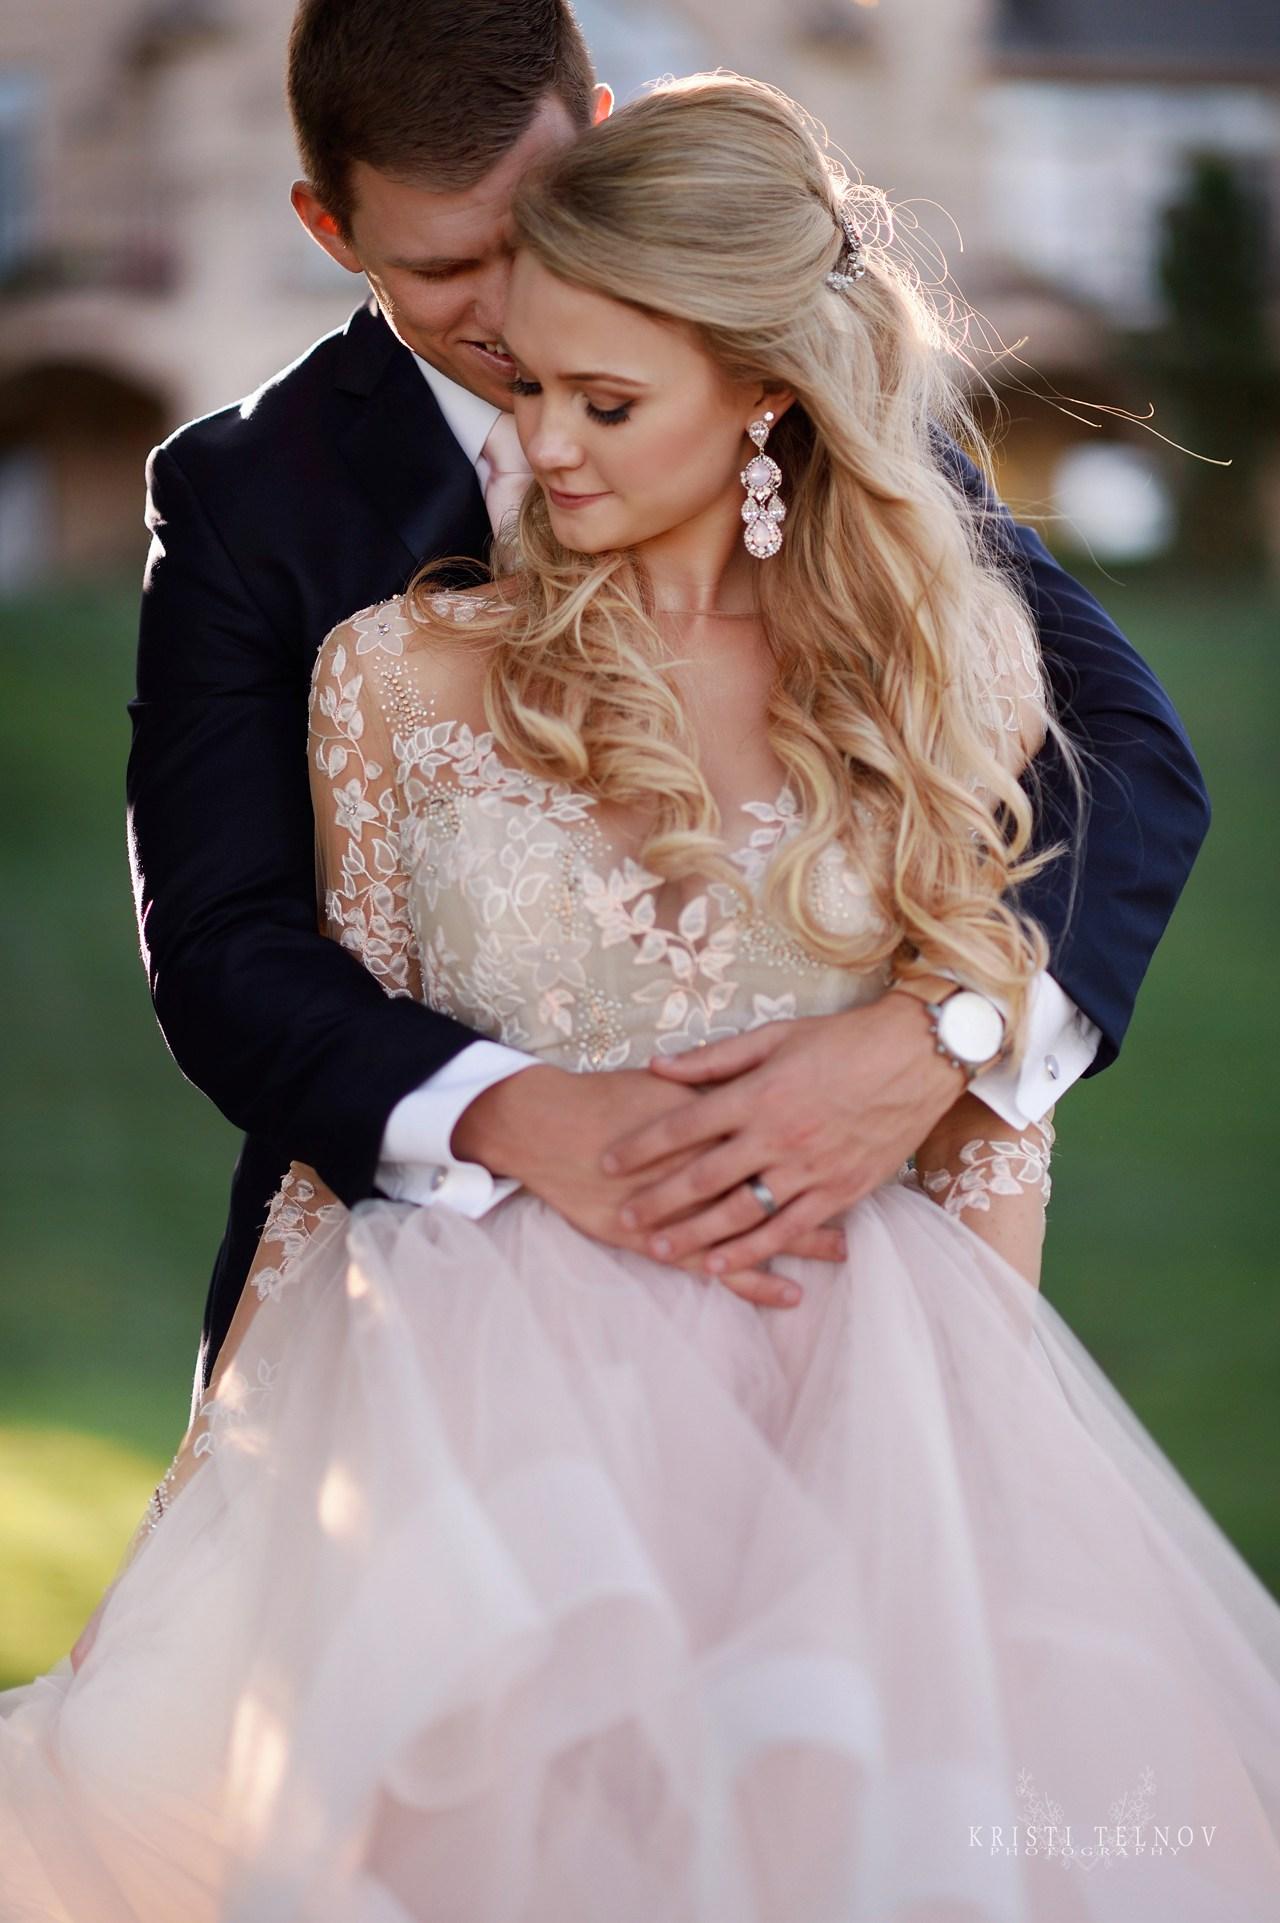 Piitsburgh-Wedding-Photo113.jpg